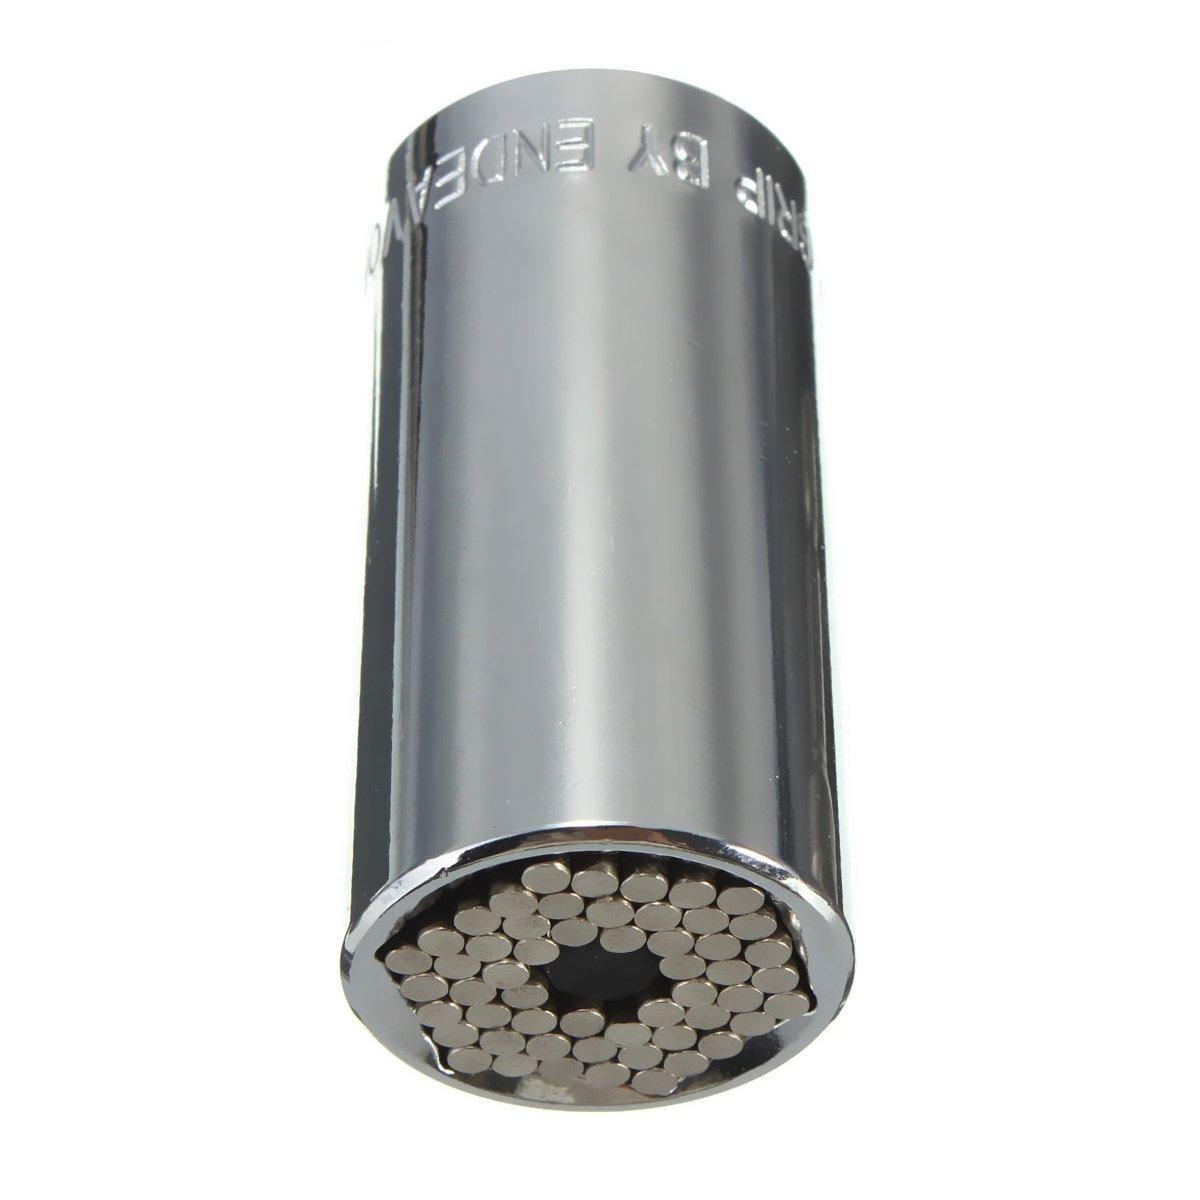 GATOR GRIP Steckschlü ssel Multi Funktions Handwerkzeuge Universal Reparatur Werkzeuge 7-19mm AIMENTE Electronic Technology Co. Ltd A296462U